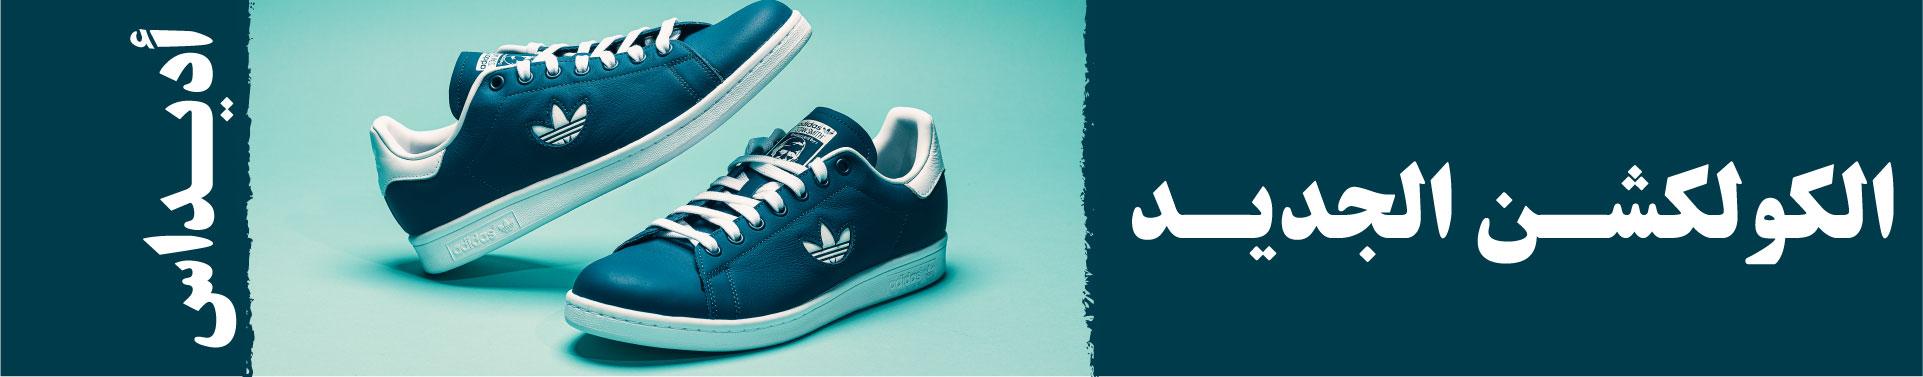 Adidas_newarrival_SFLWebApp